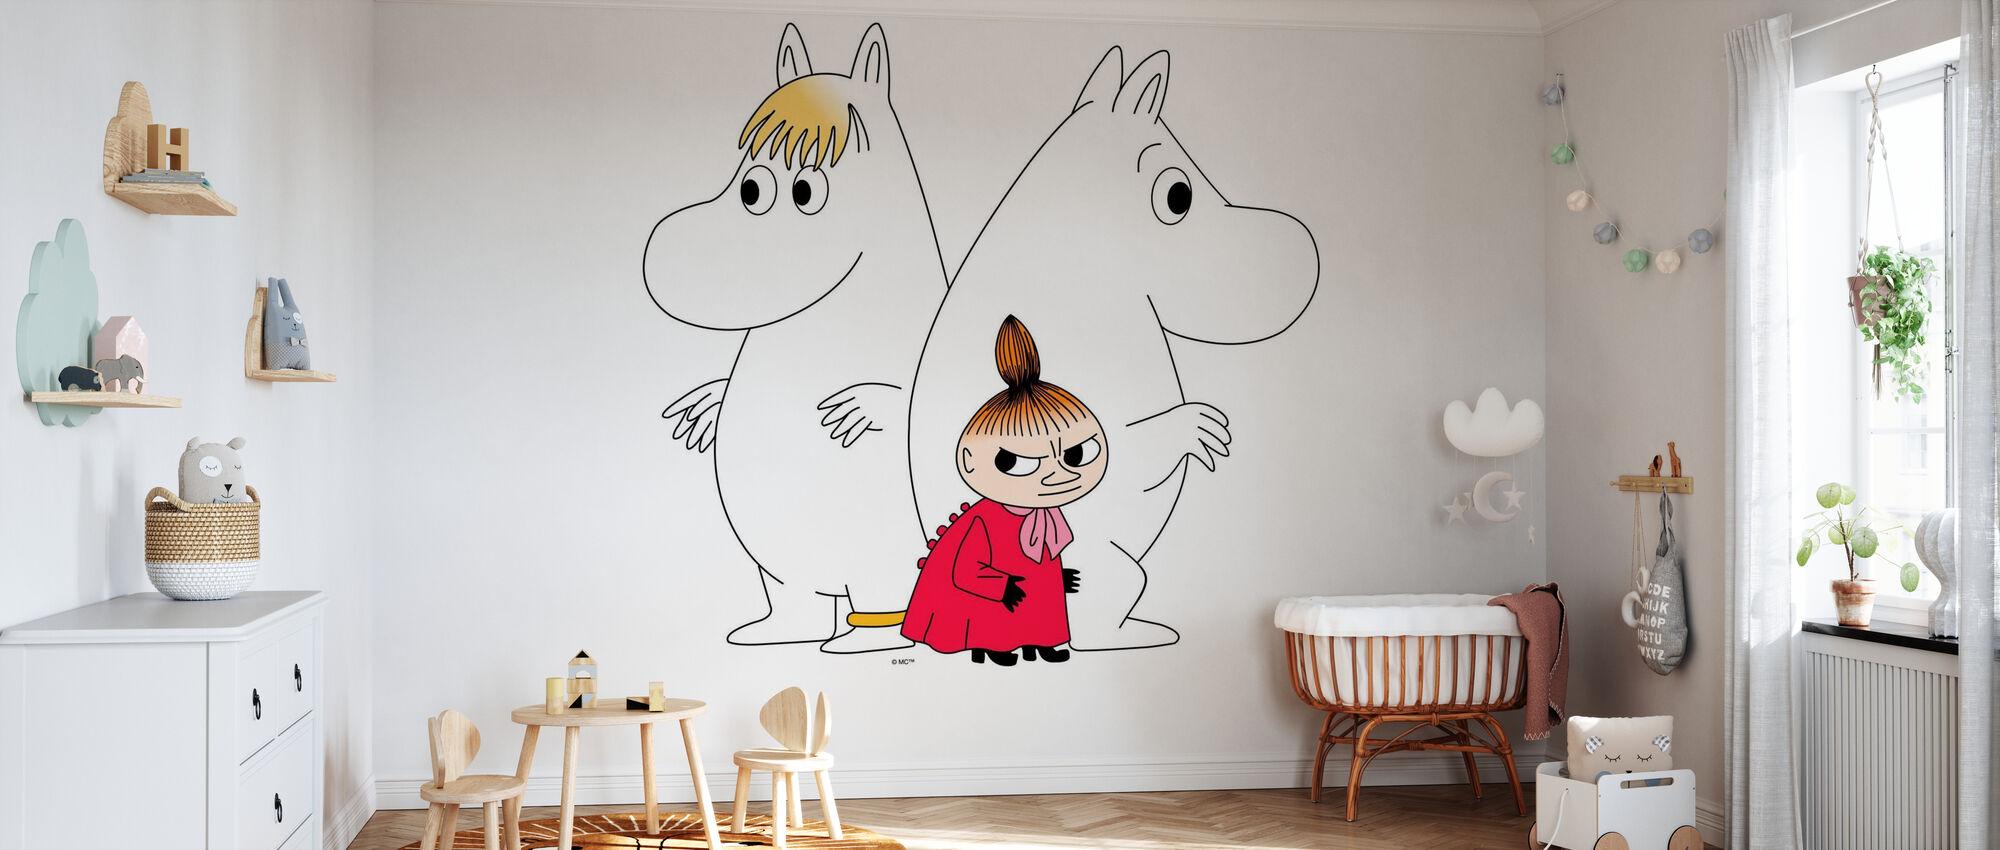 Moomin - Snorkmaiden and Little My - Wallpaper - Nursery